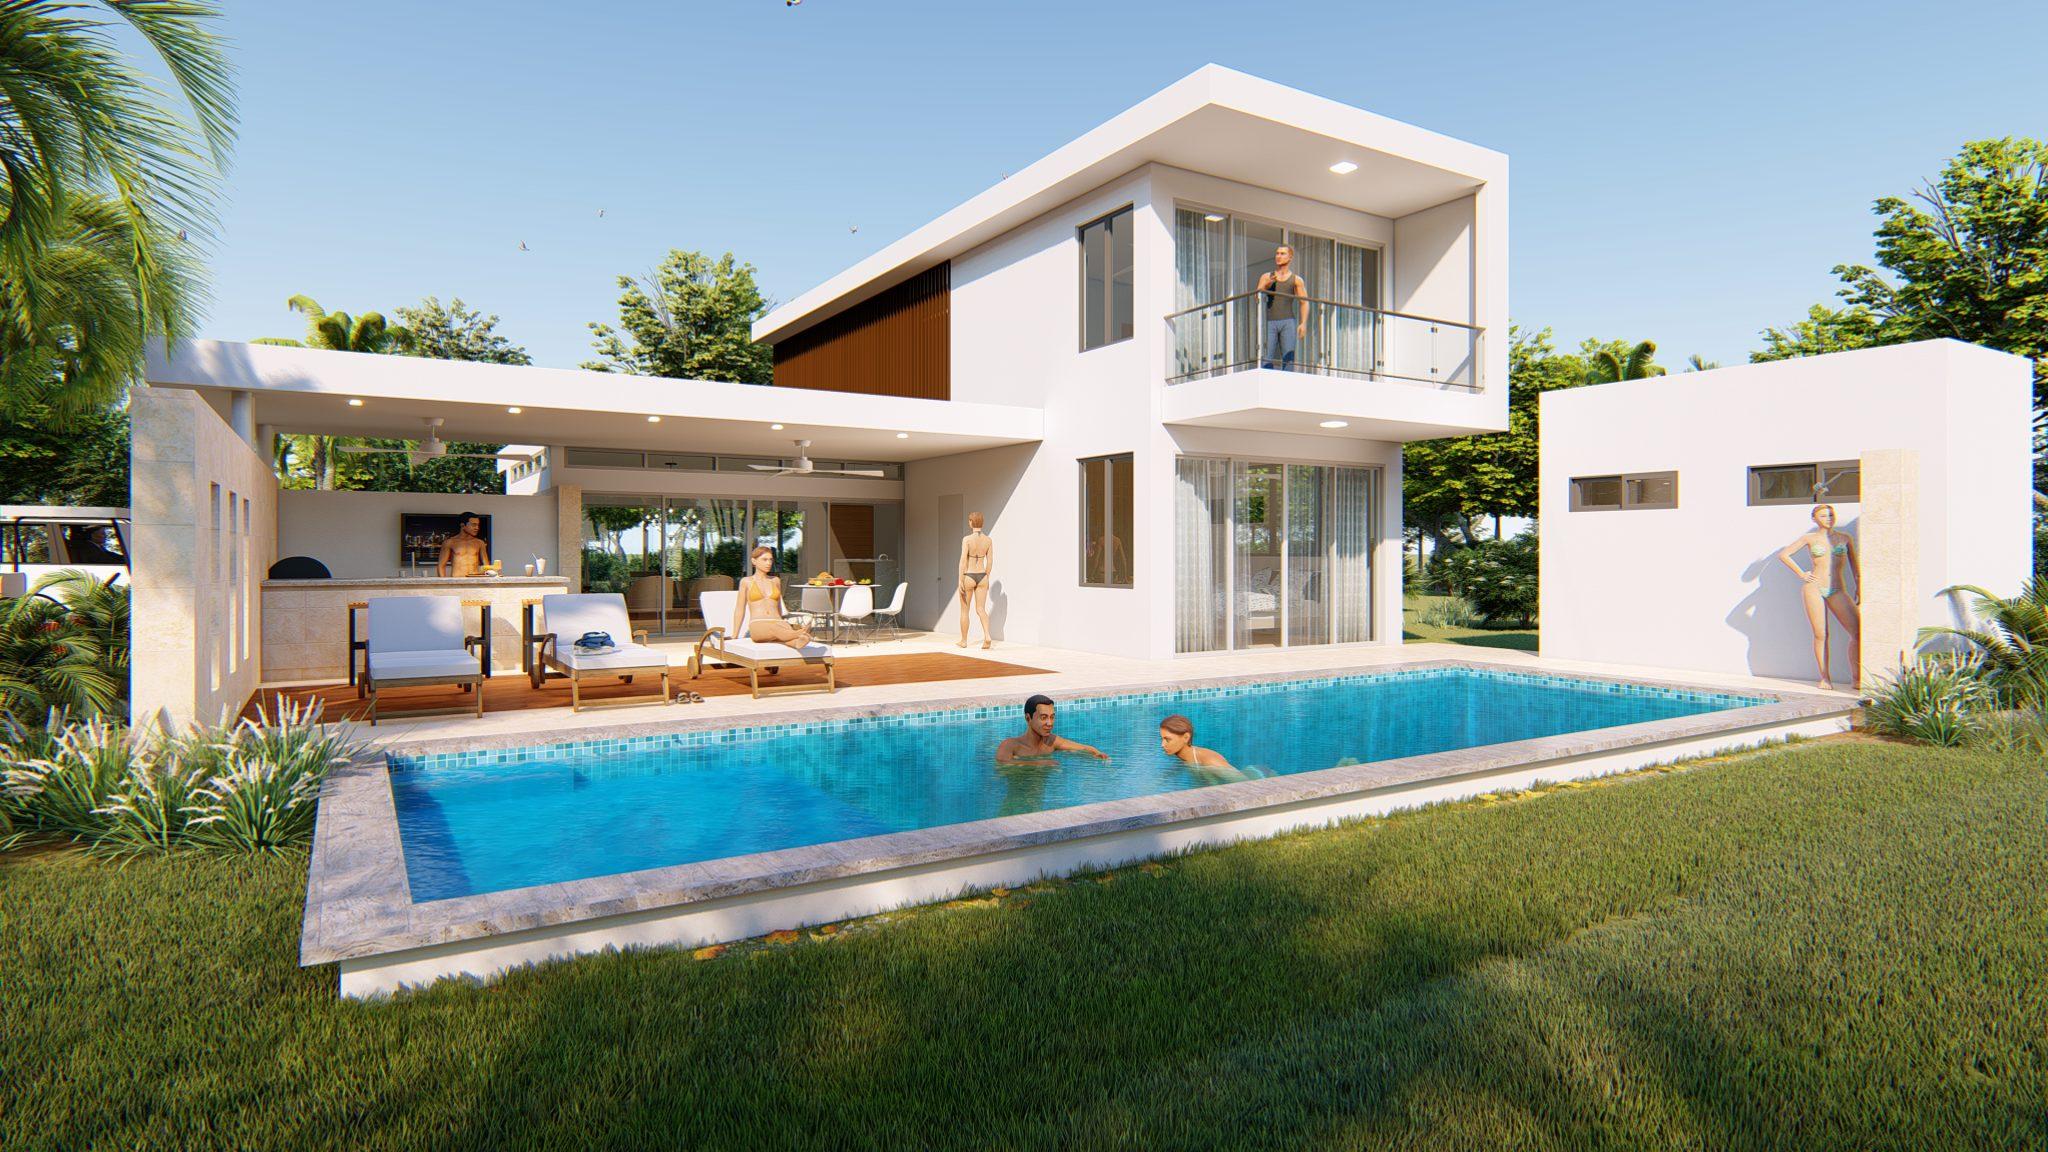 3 Bedroom Modern Villa Sale Sosua Dominican Republic